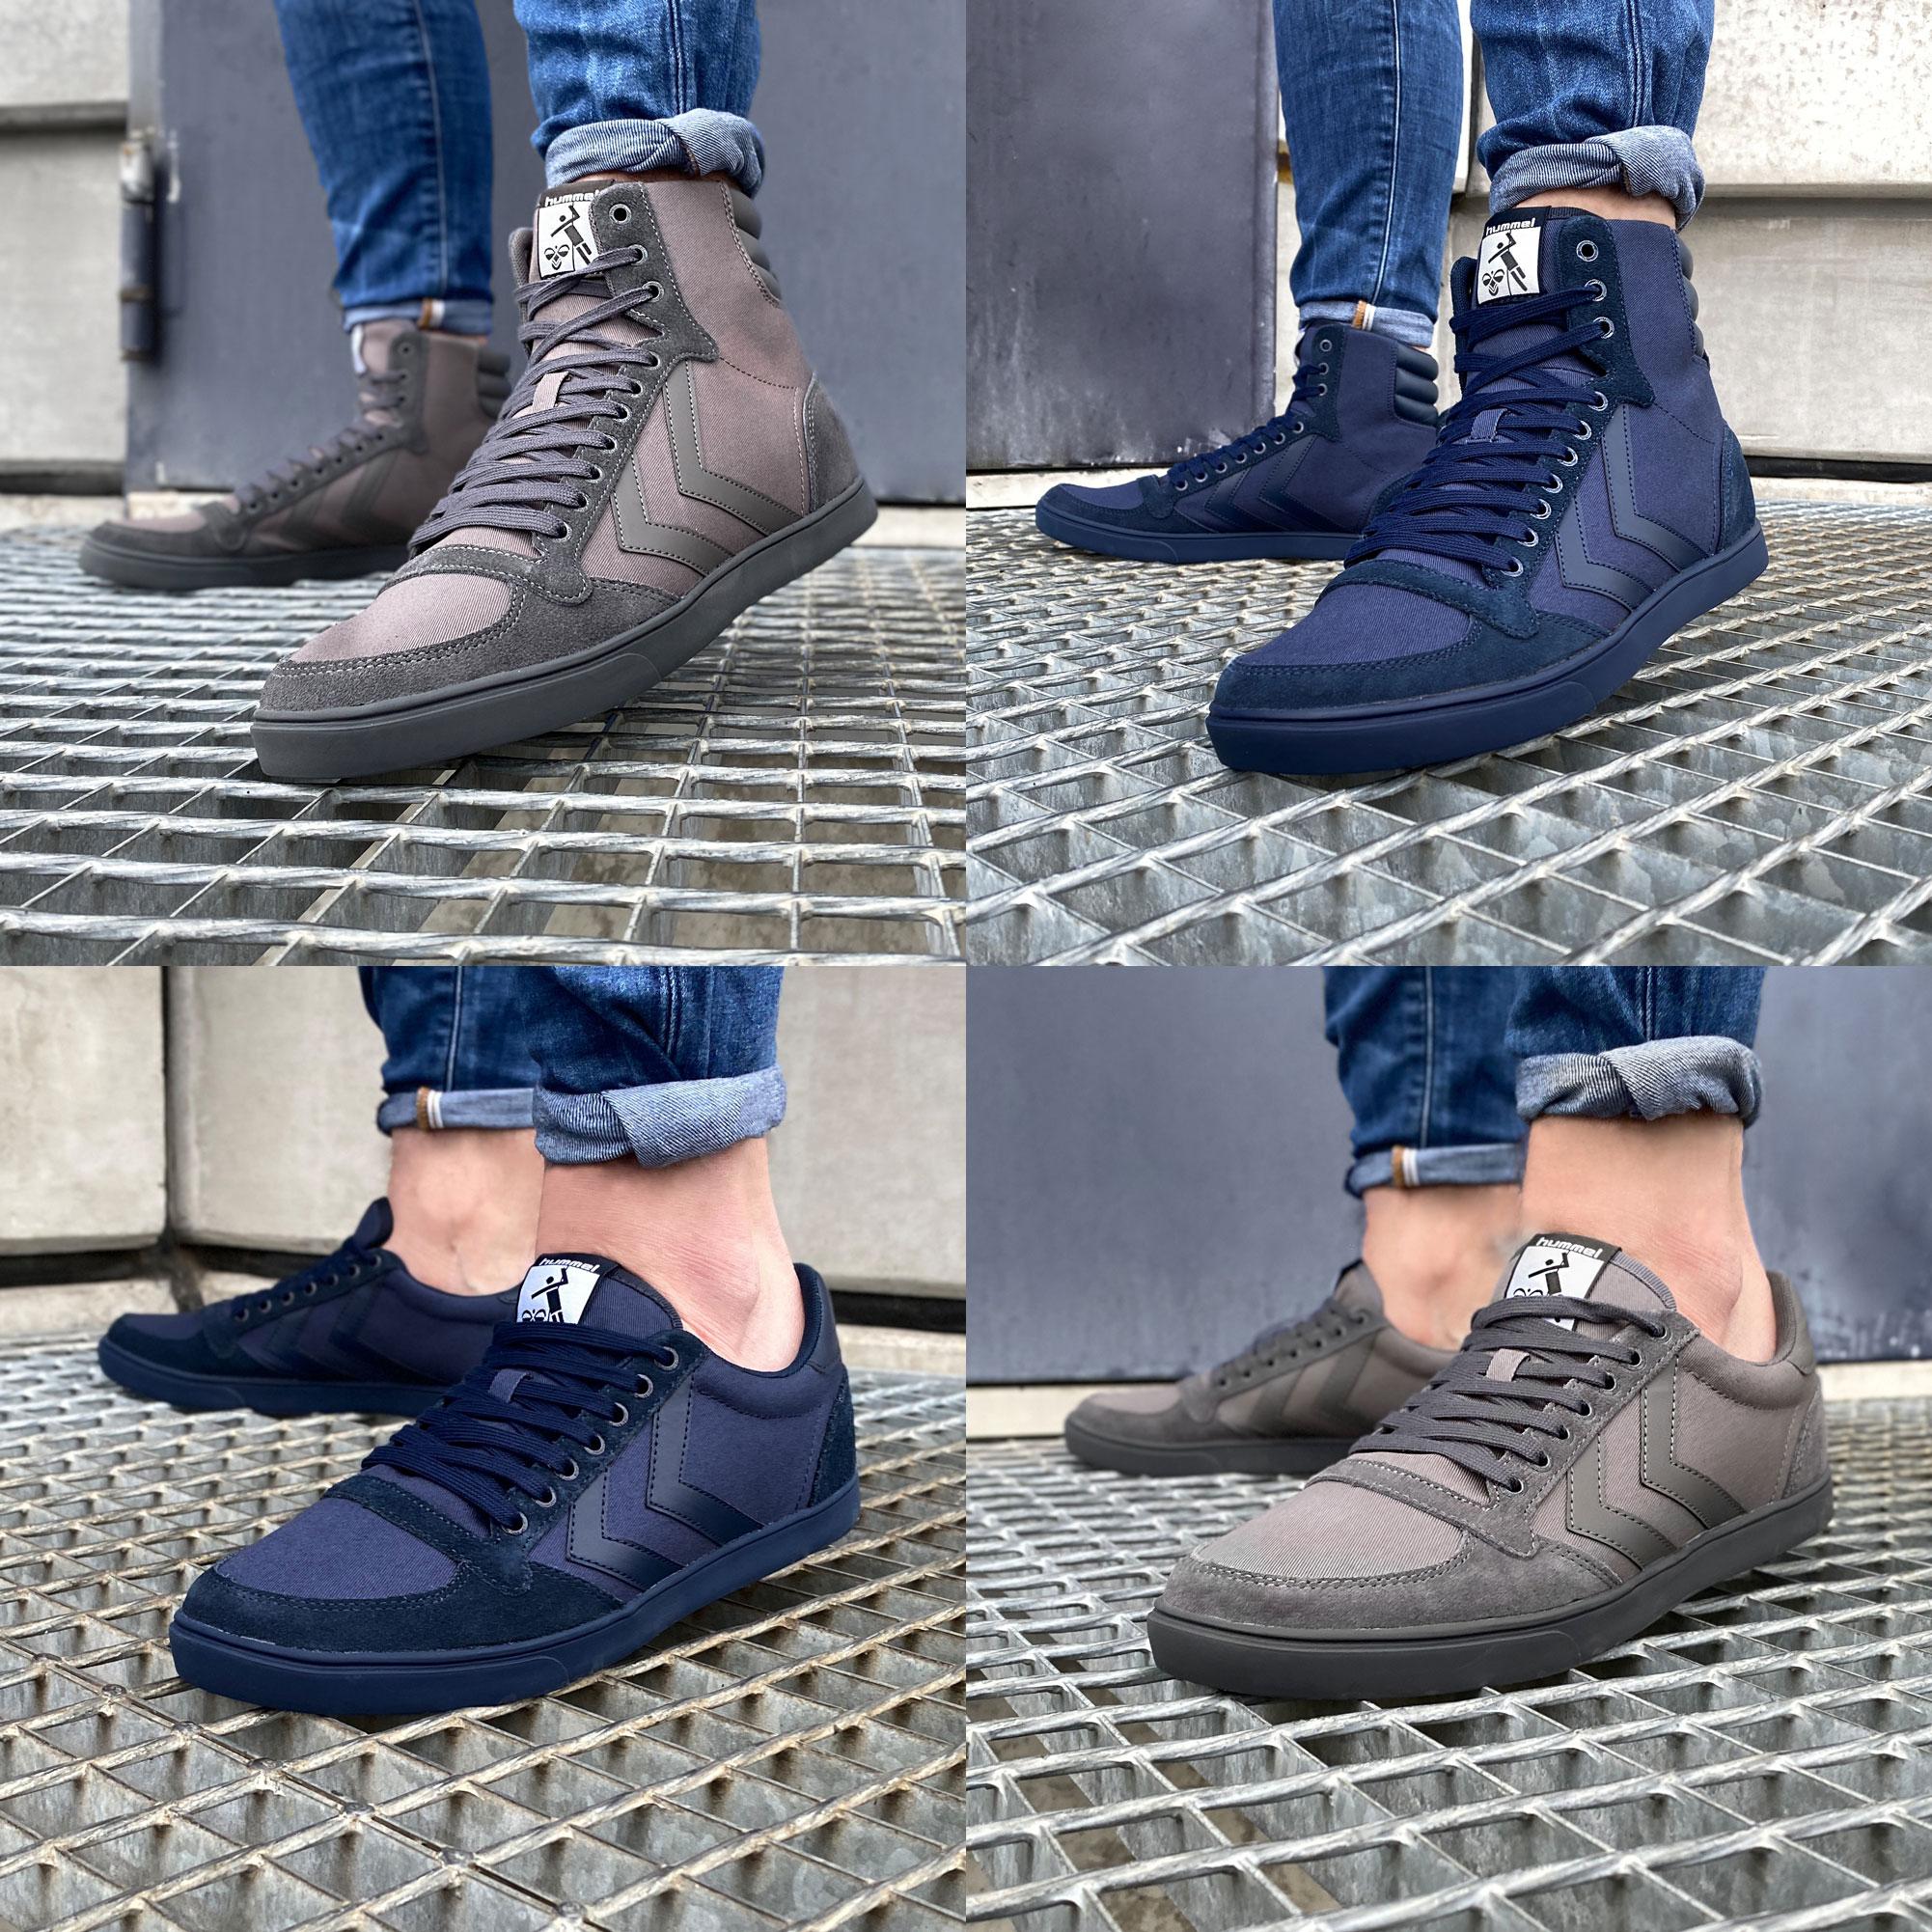 Hummel Slimmer Stadil Tonal Sneakers